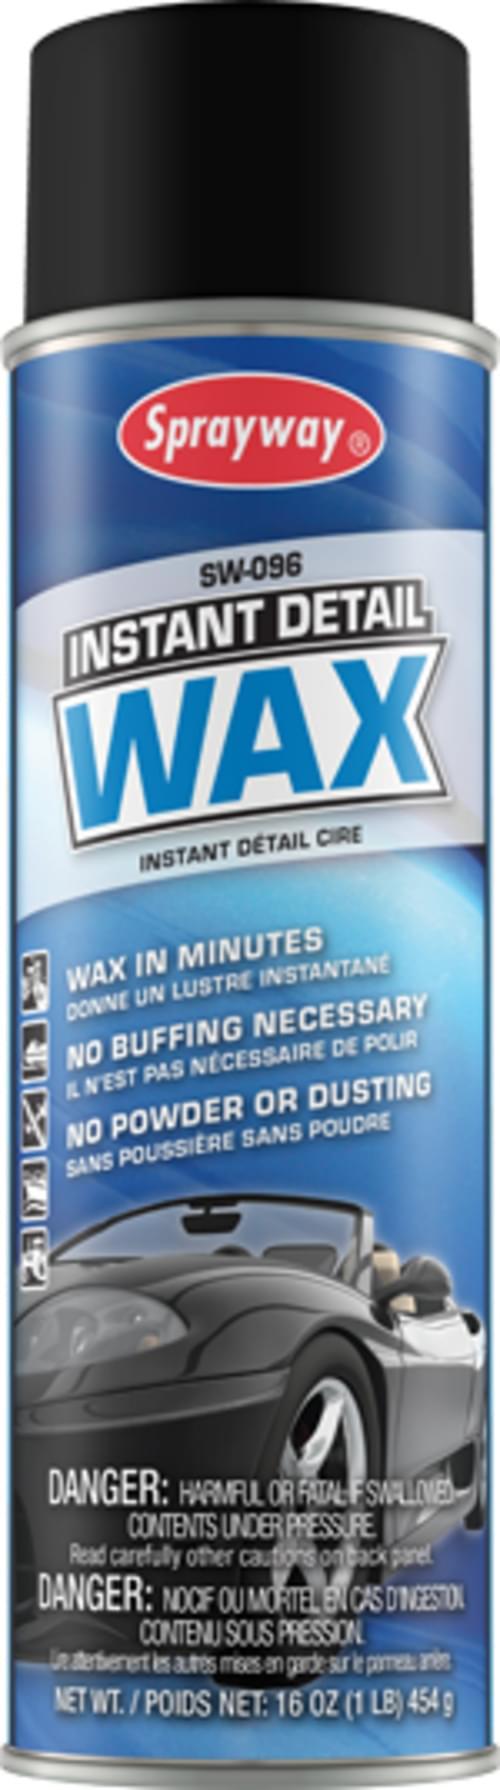 20 oz. Instant Detail Wax